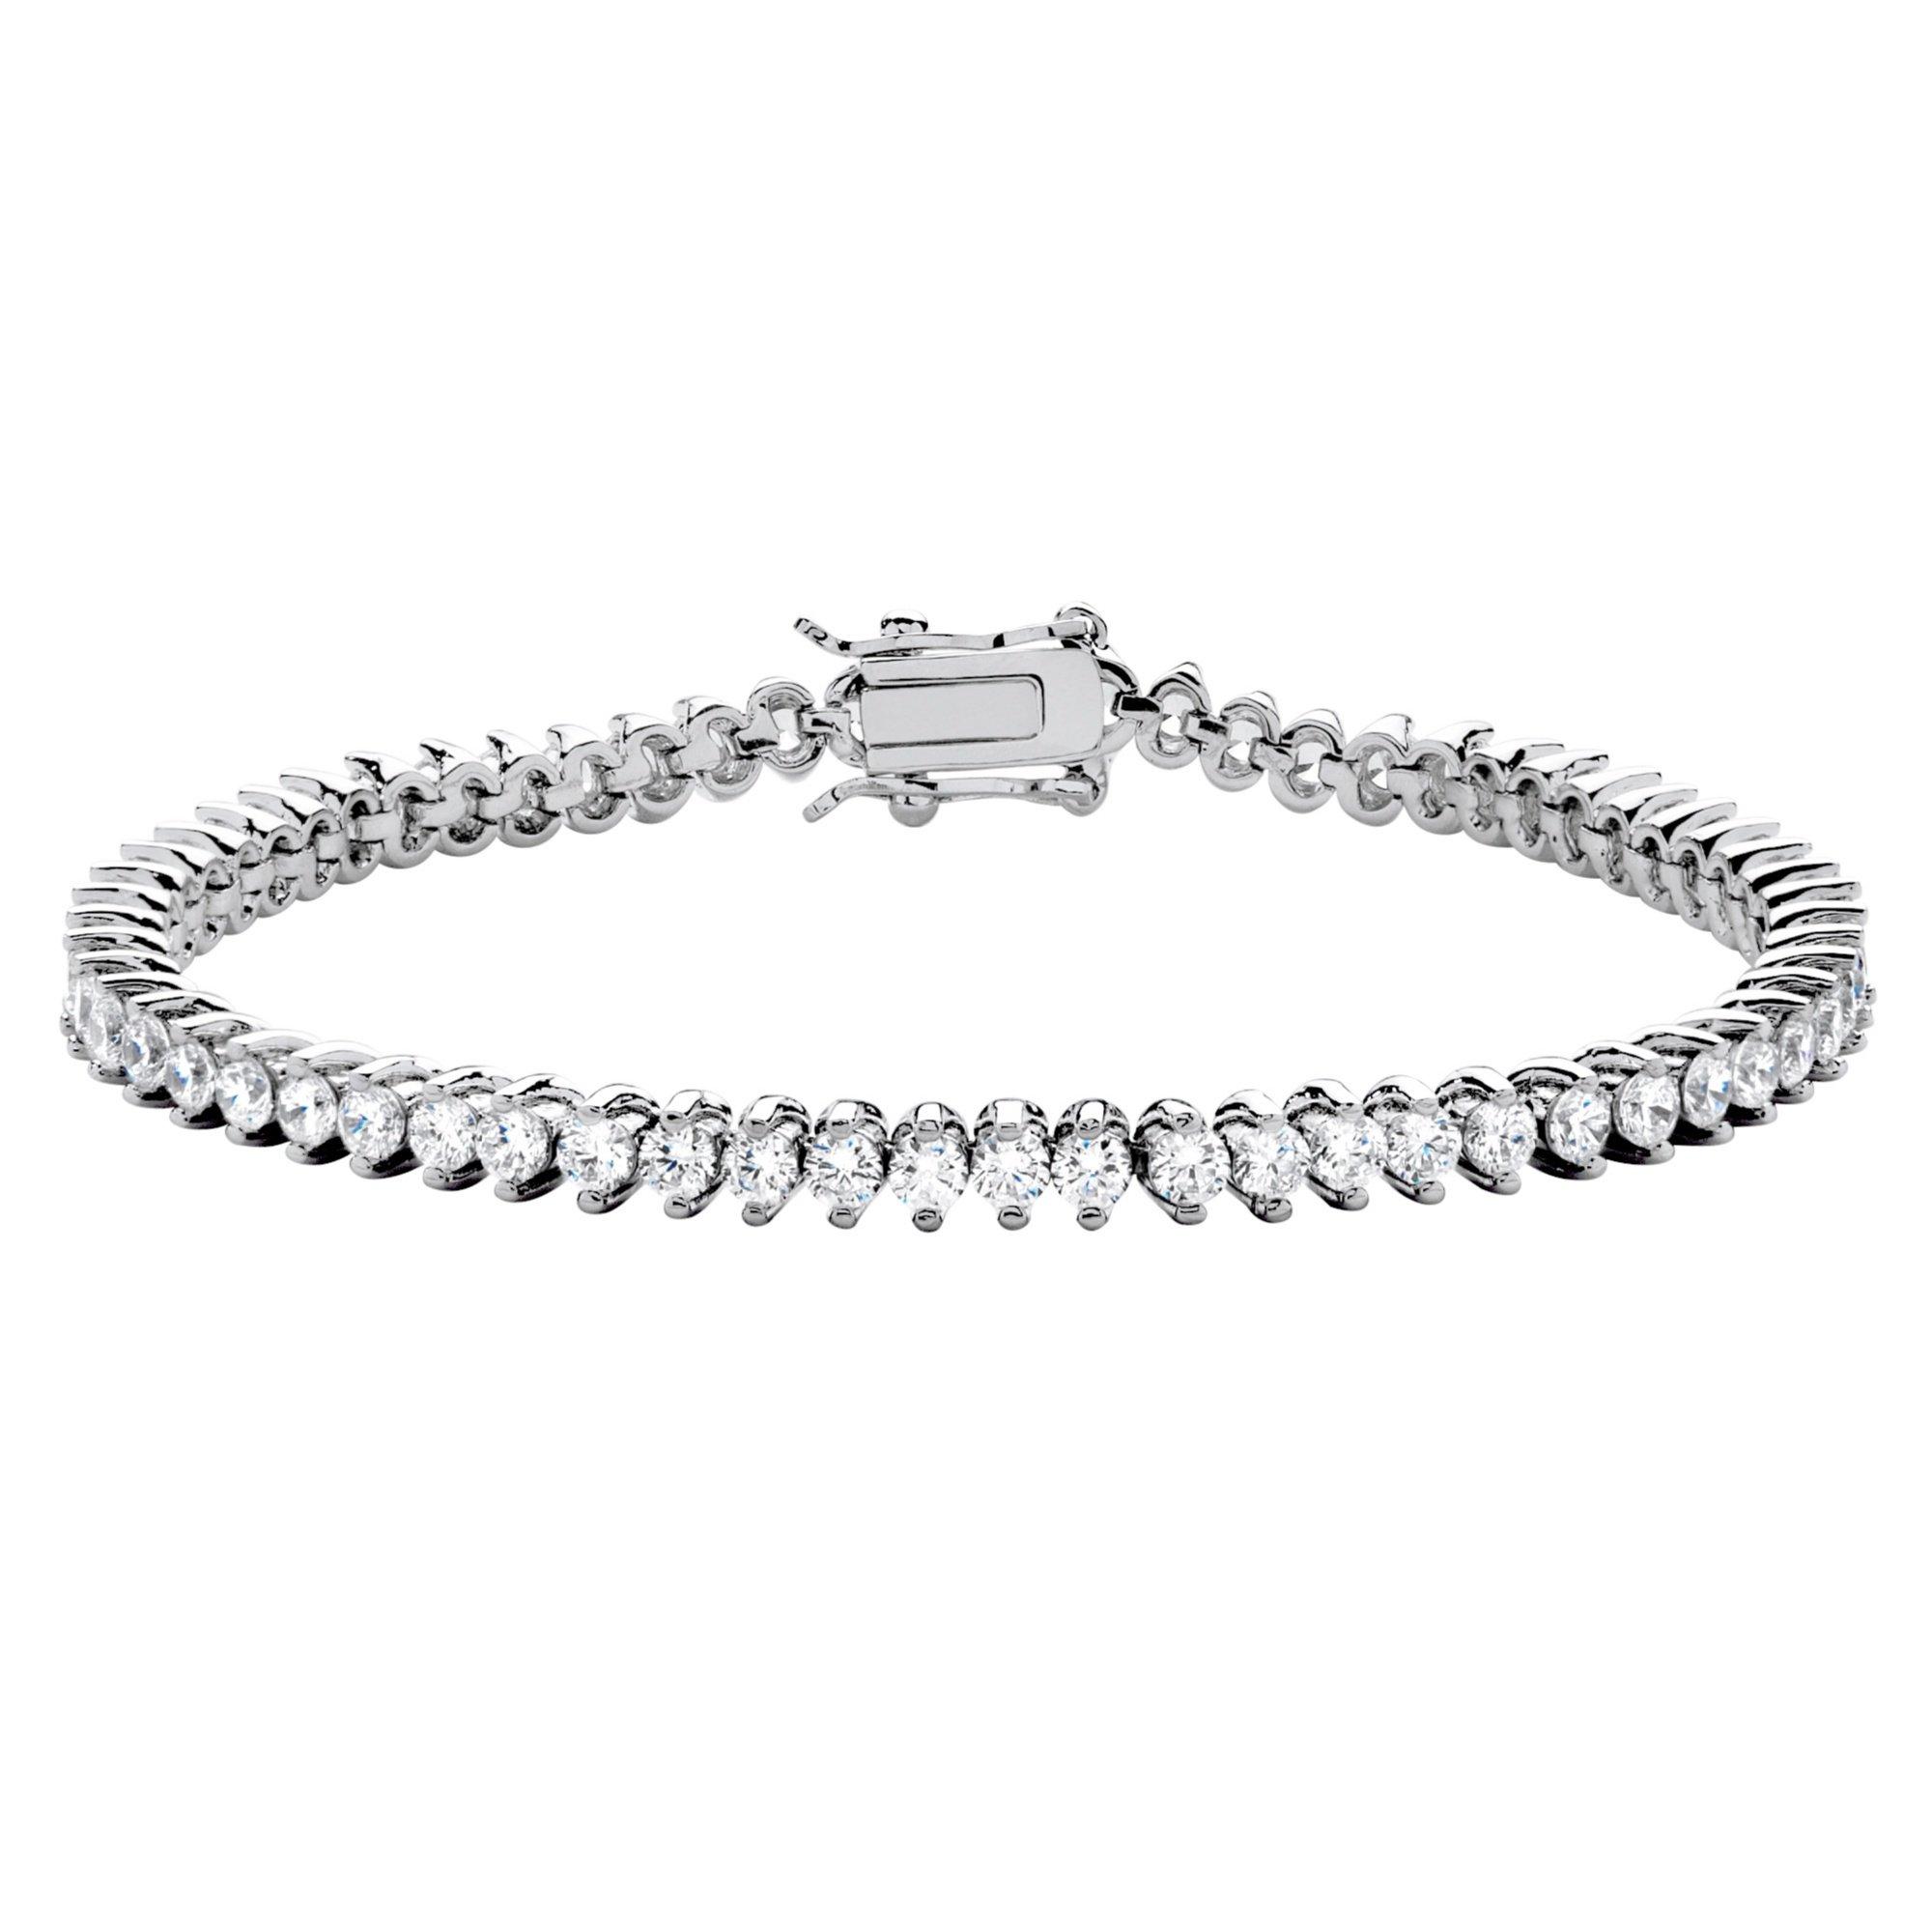 Seta Jewelry White Cubic Zirconia Platinum-Plated Tennis Bracelet 7.5''